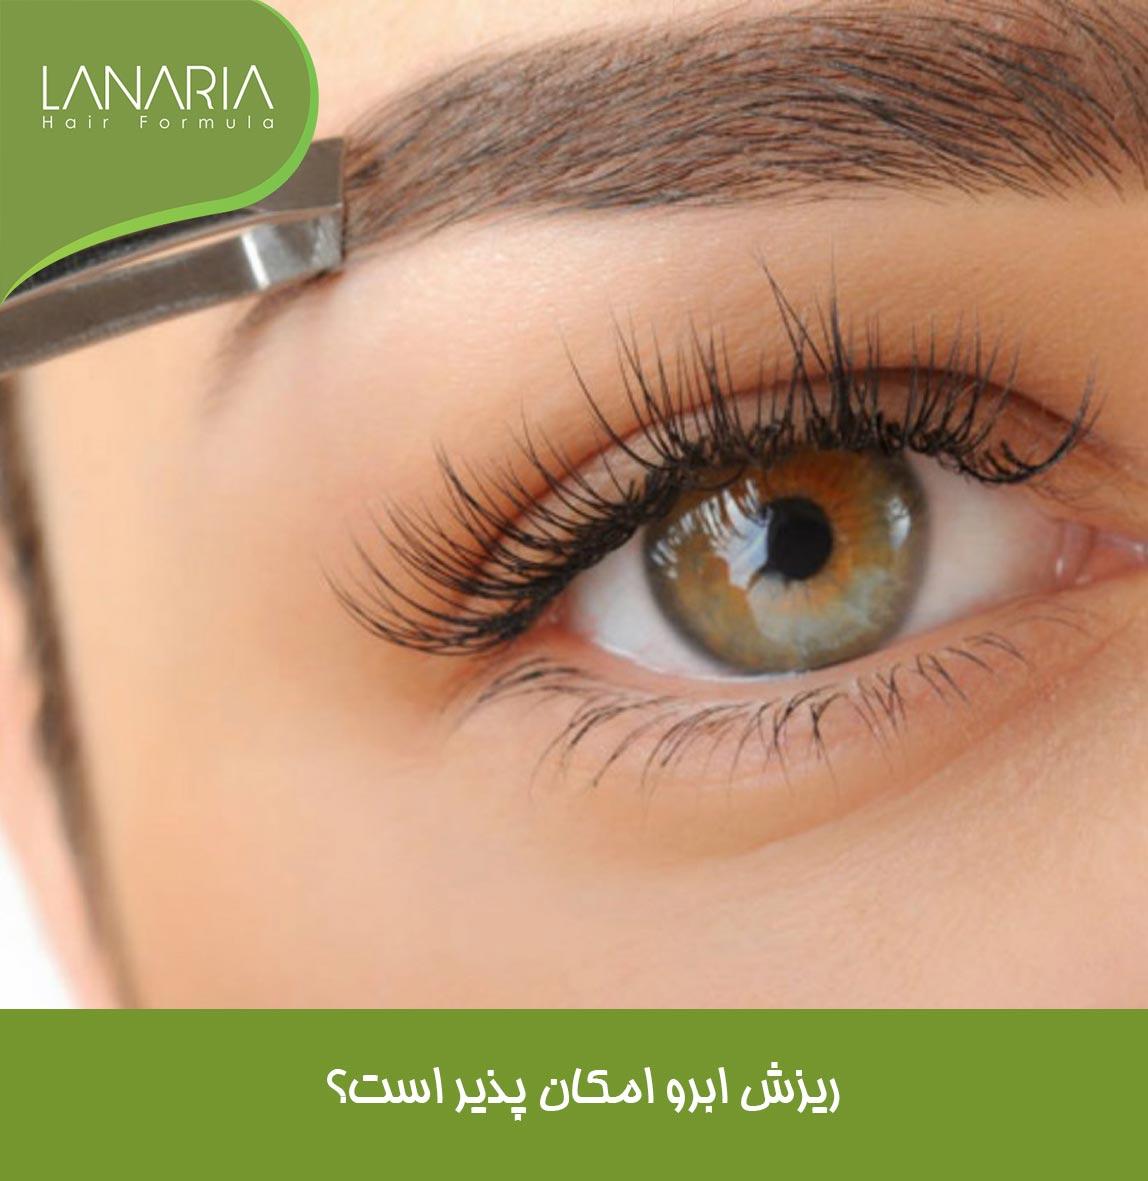 درمان ریزش ابرو -کرم ابرو لاناریا-lanaria - دکتر نوروزیان